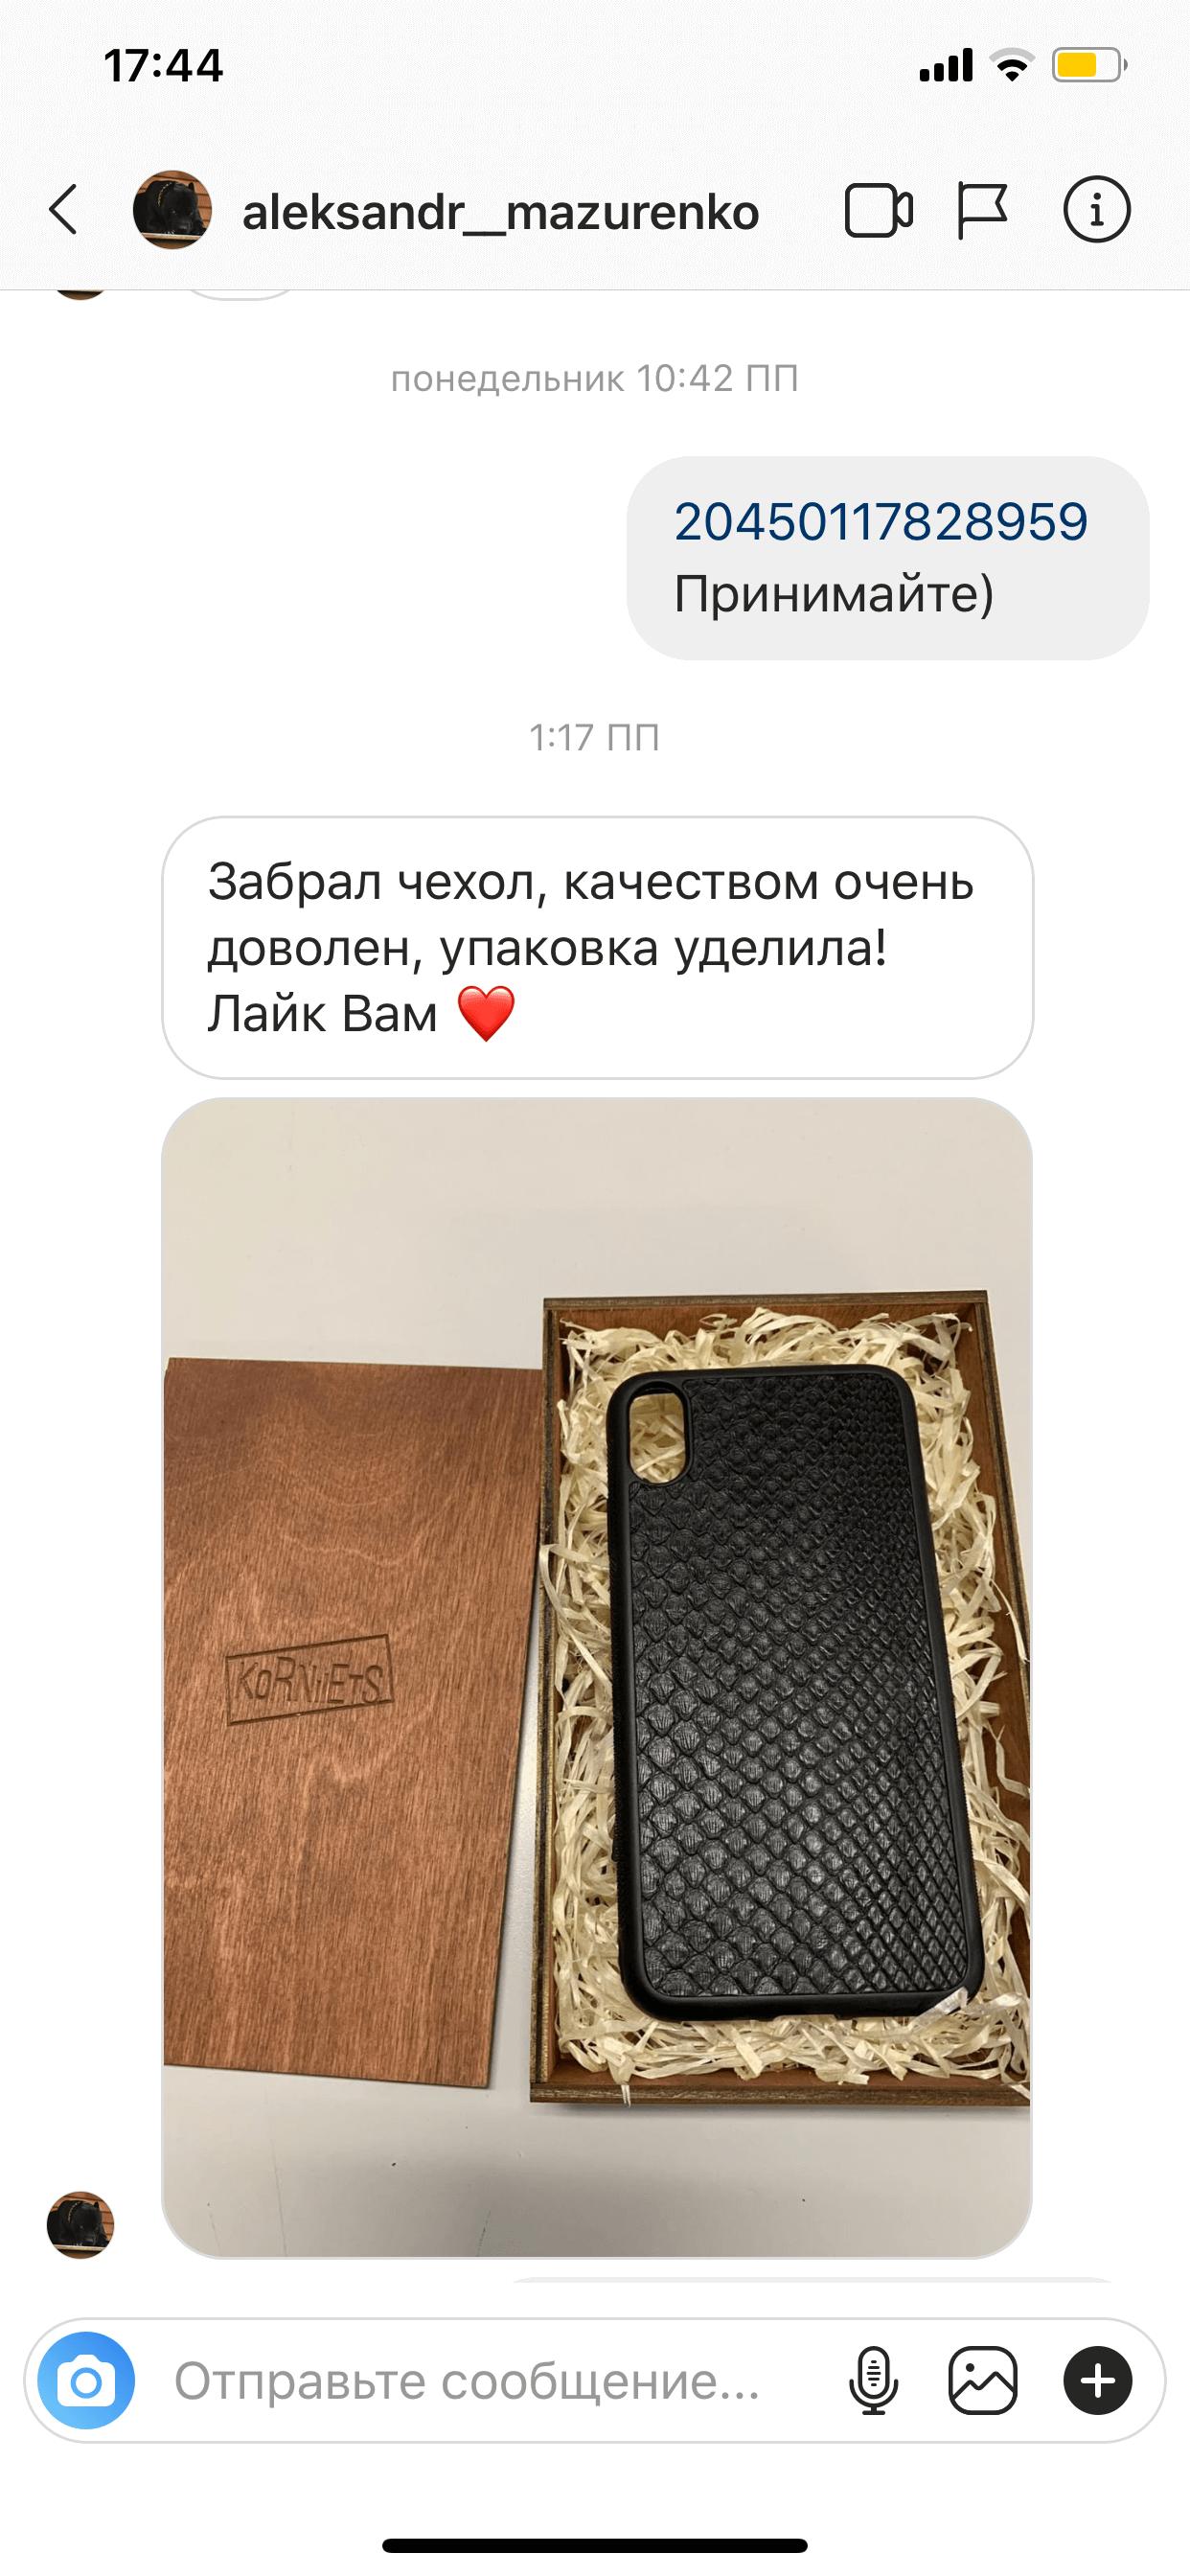 Image #1 from alexandr__mazurenko